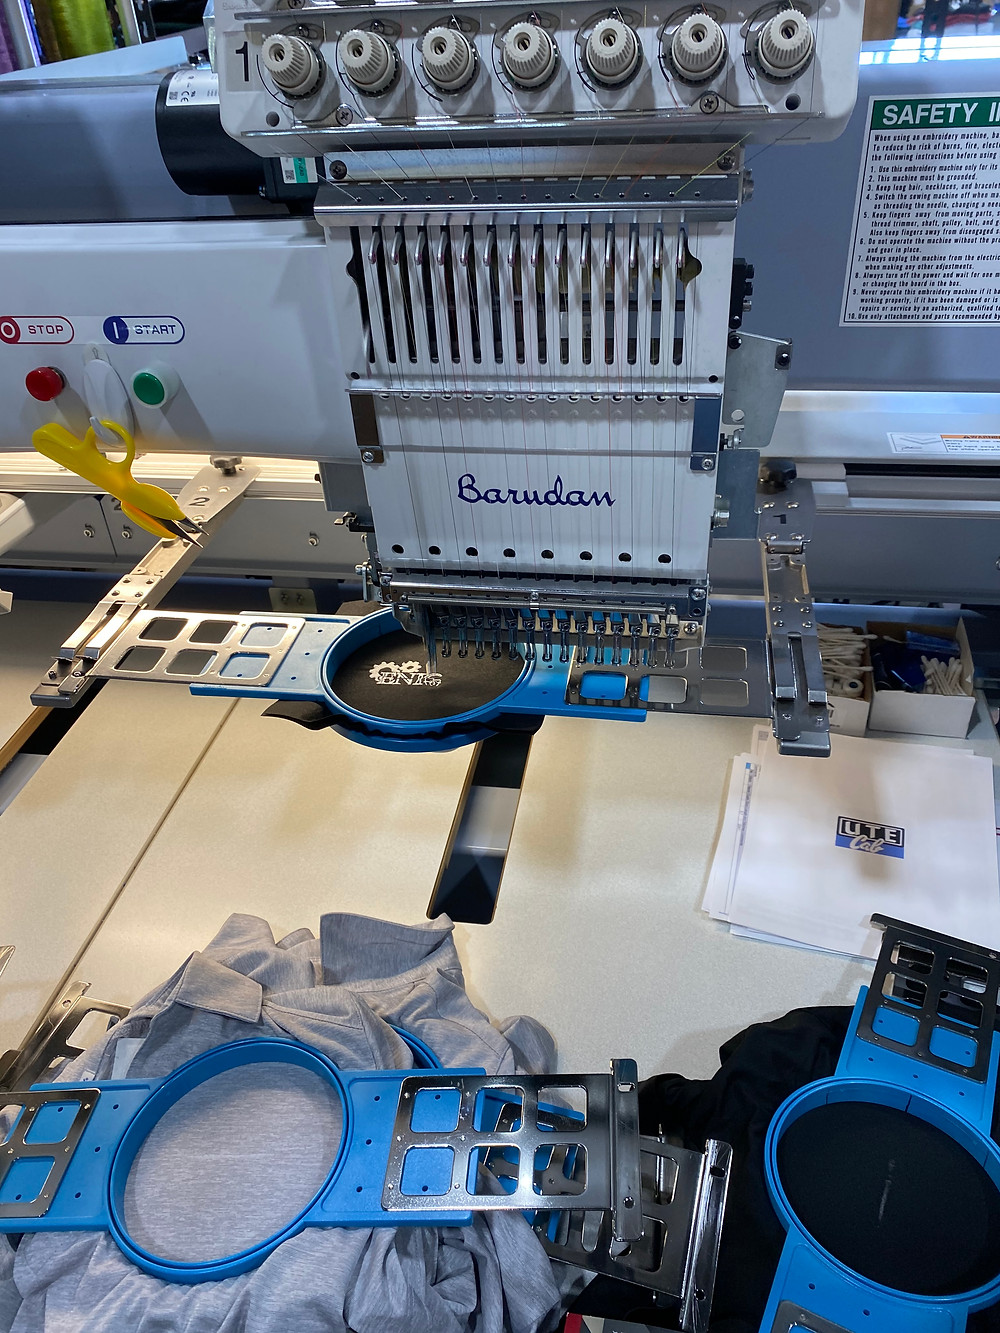 An Advantage Embroidery machine